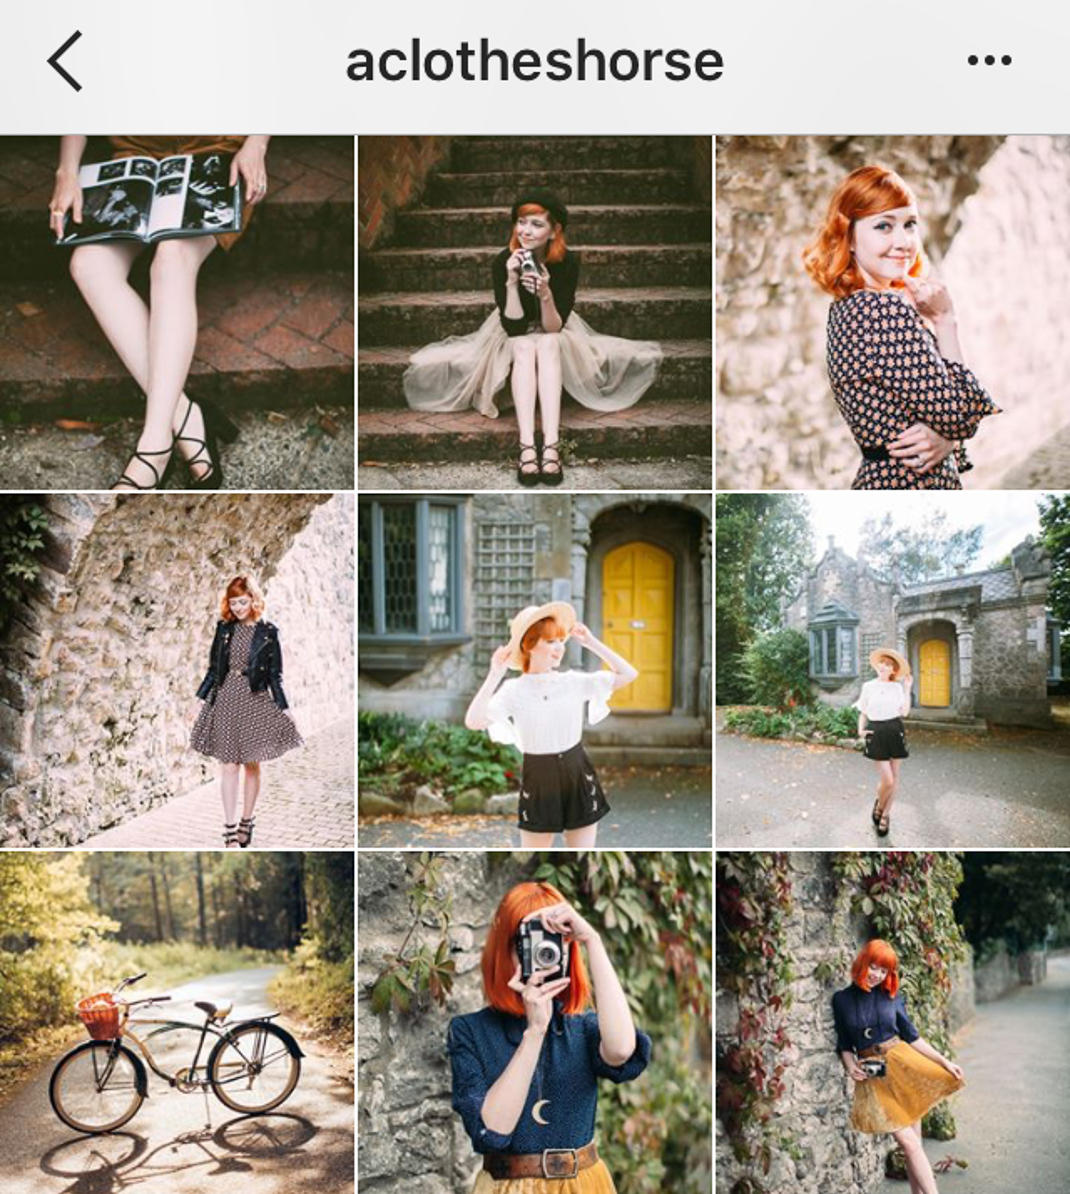 aclotheshorse instagram